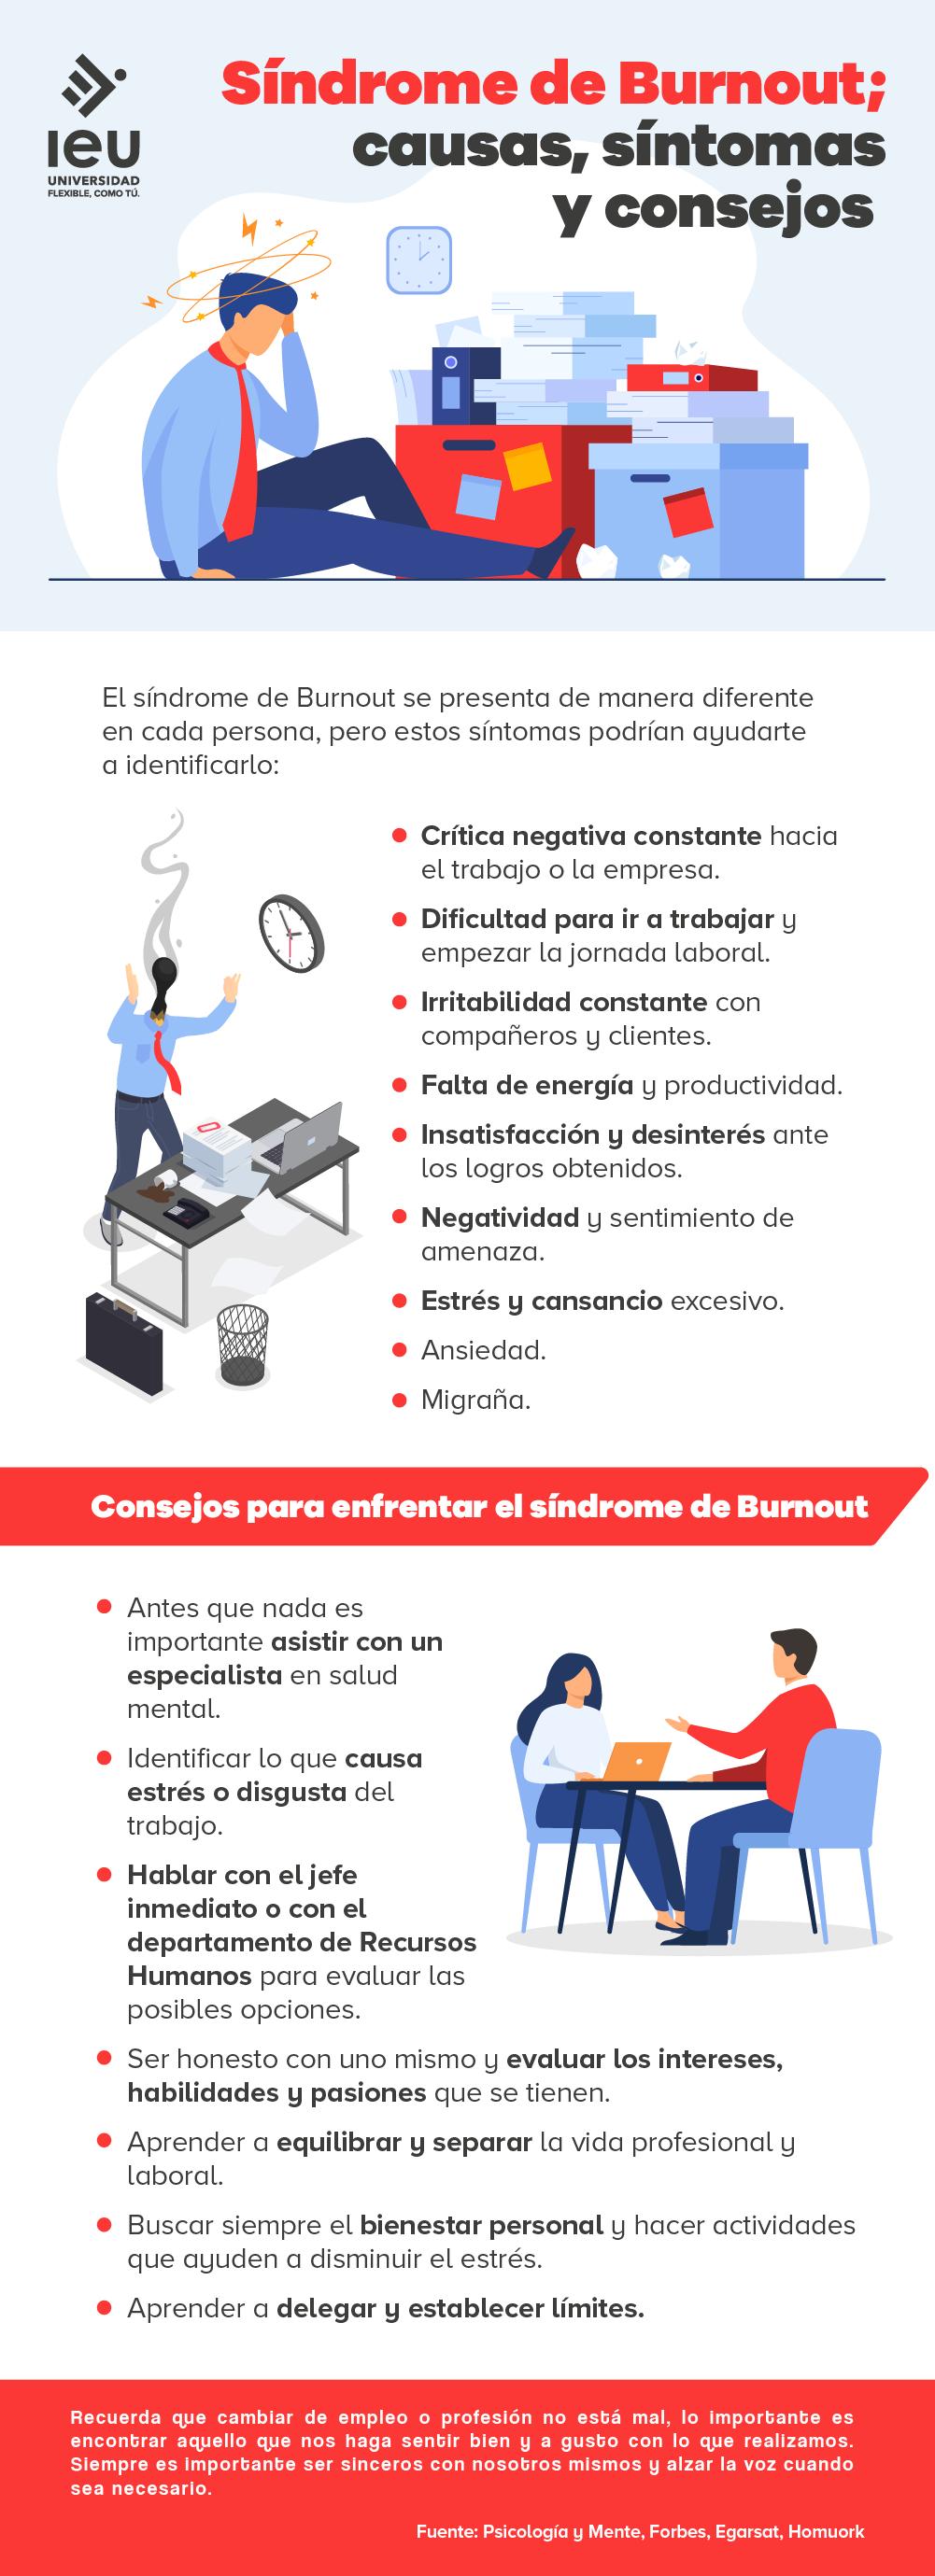 síndrome de burnout causas síntomas y consejos infografia